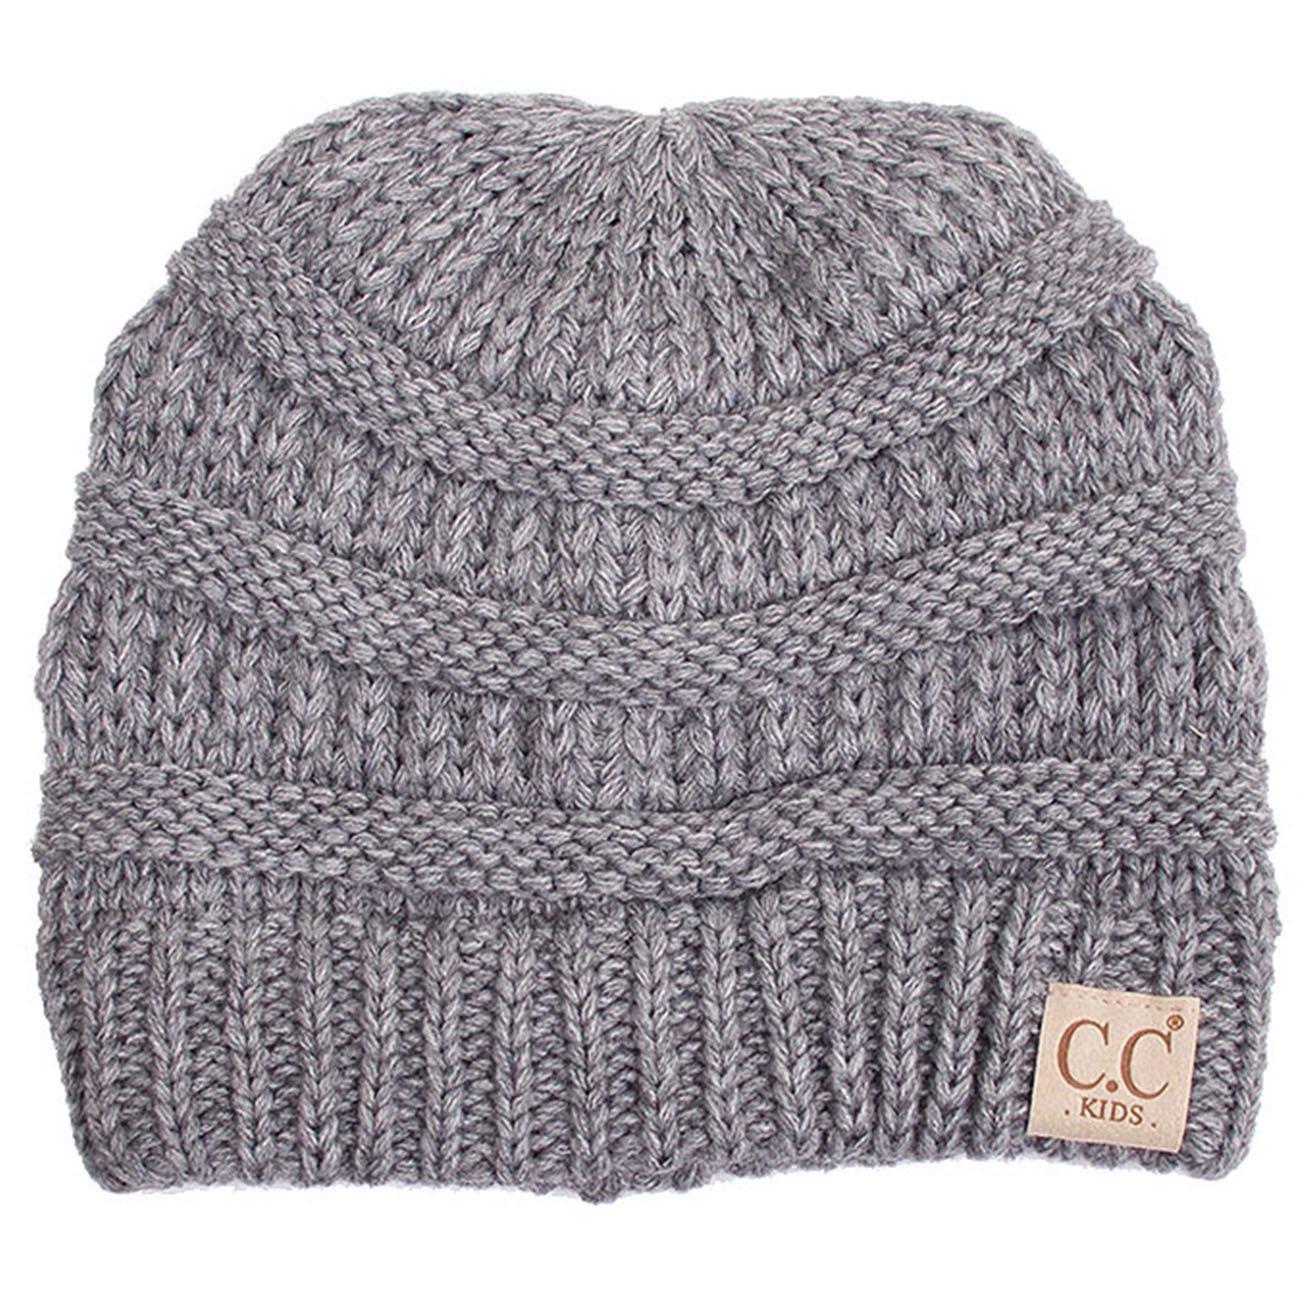 ScarvesMe Exclusive CC Knitted Children Knit Beanie (Light Melange Grey)